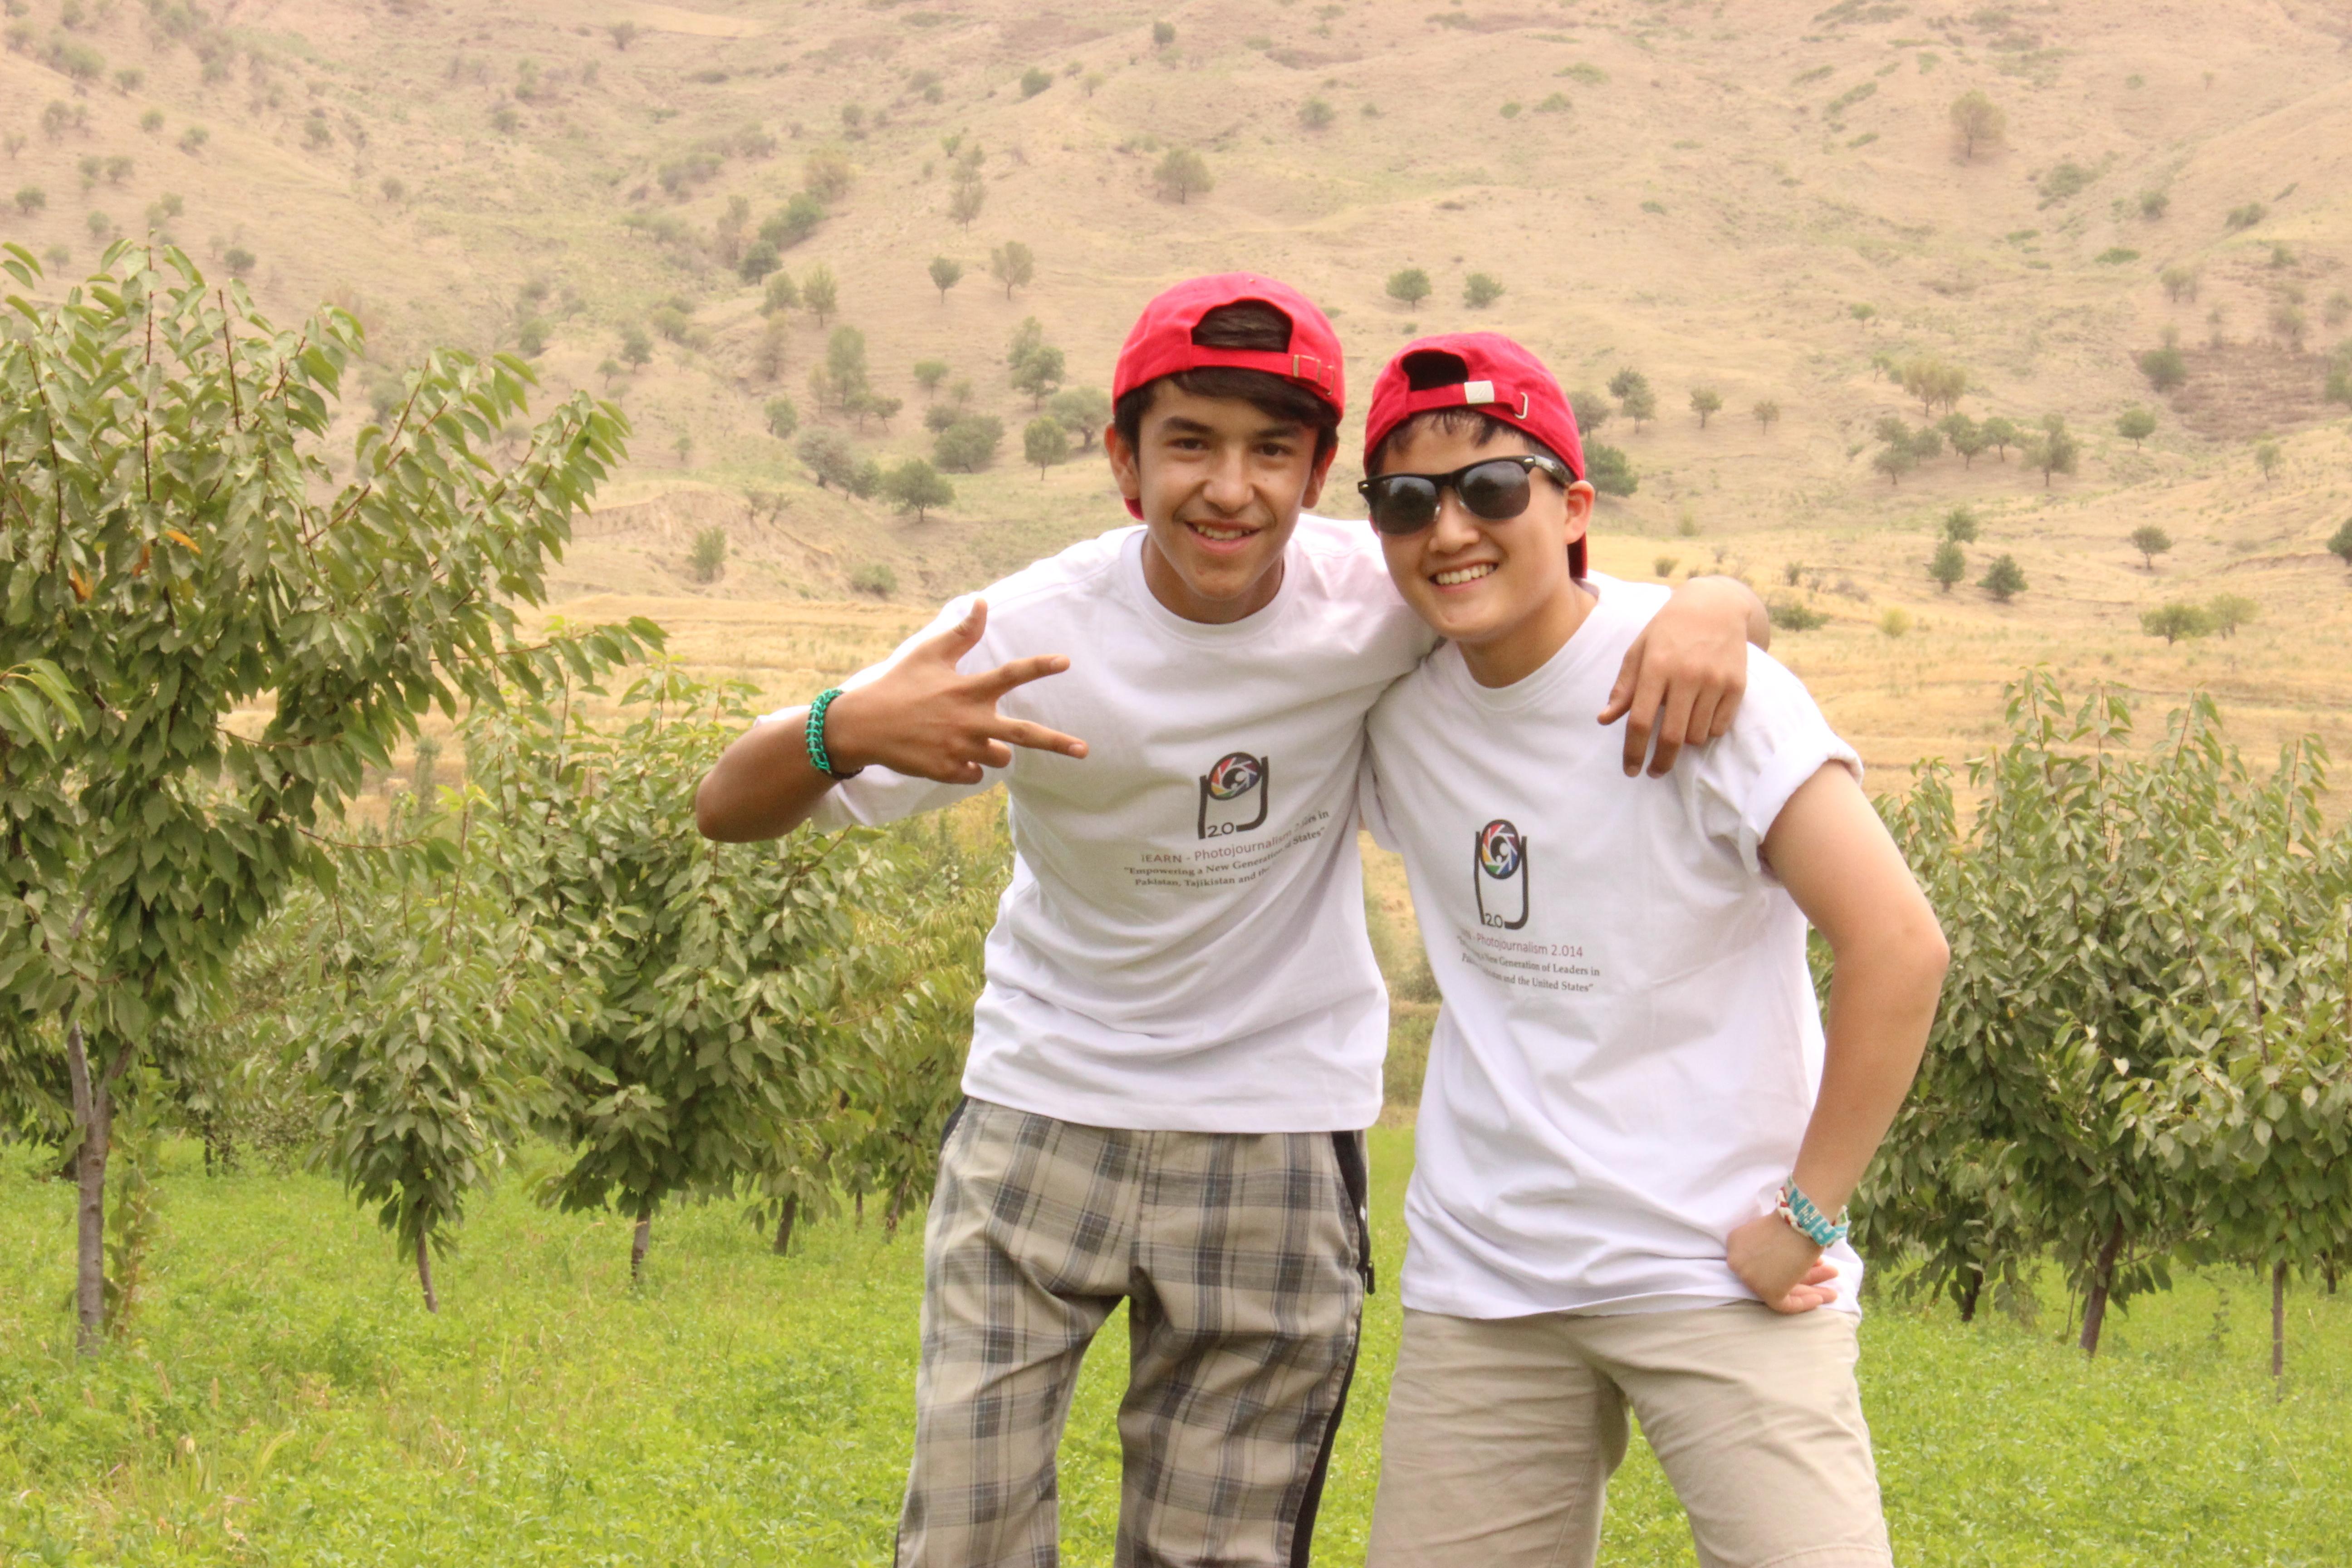 Photjournalism 2 014 Tajikistan Trey Khuyoberdi